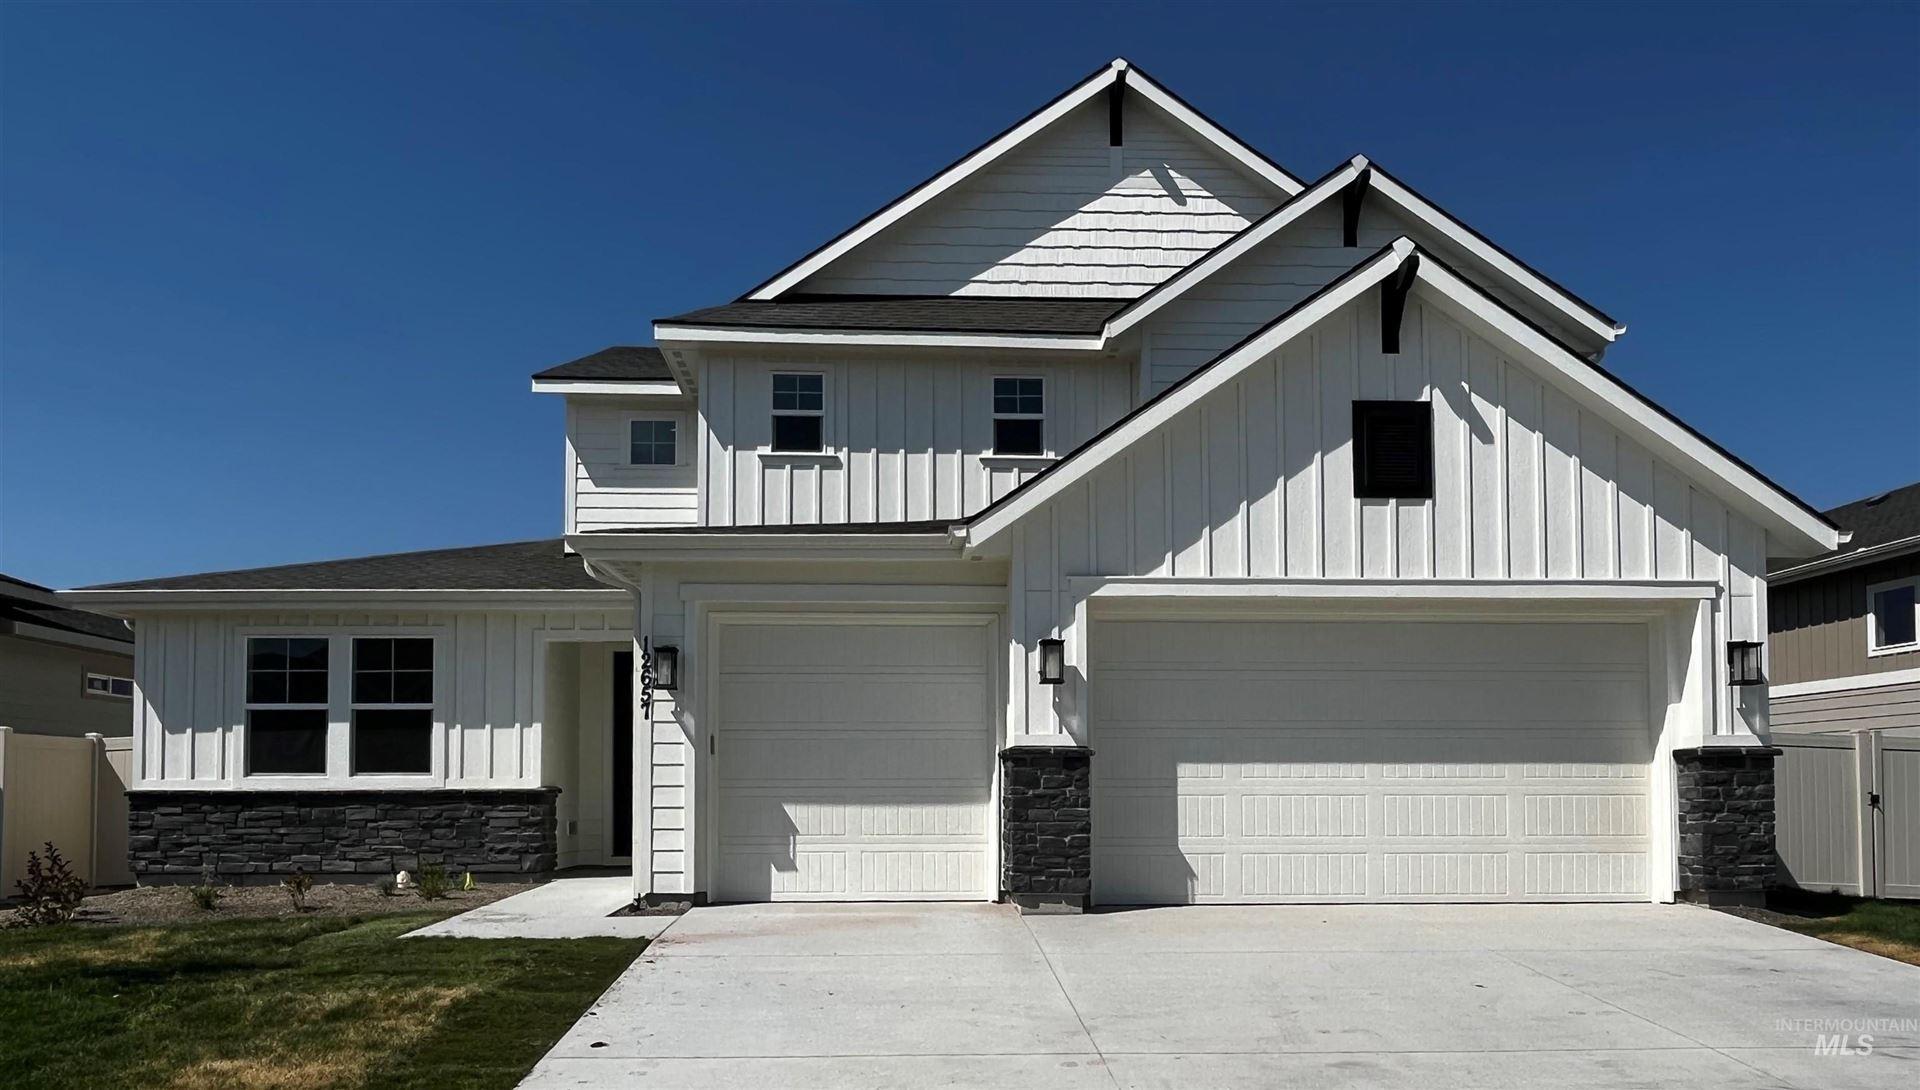 12657 S Teano Ave, Nampa, ID 83686 - MLS#: 98819479